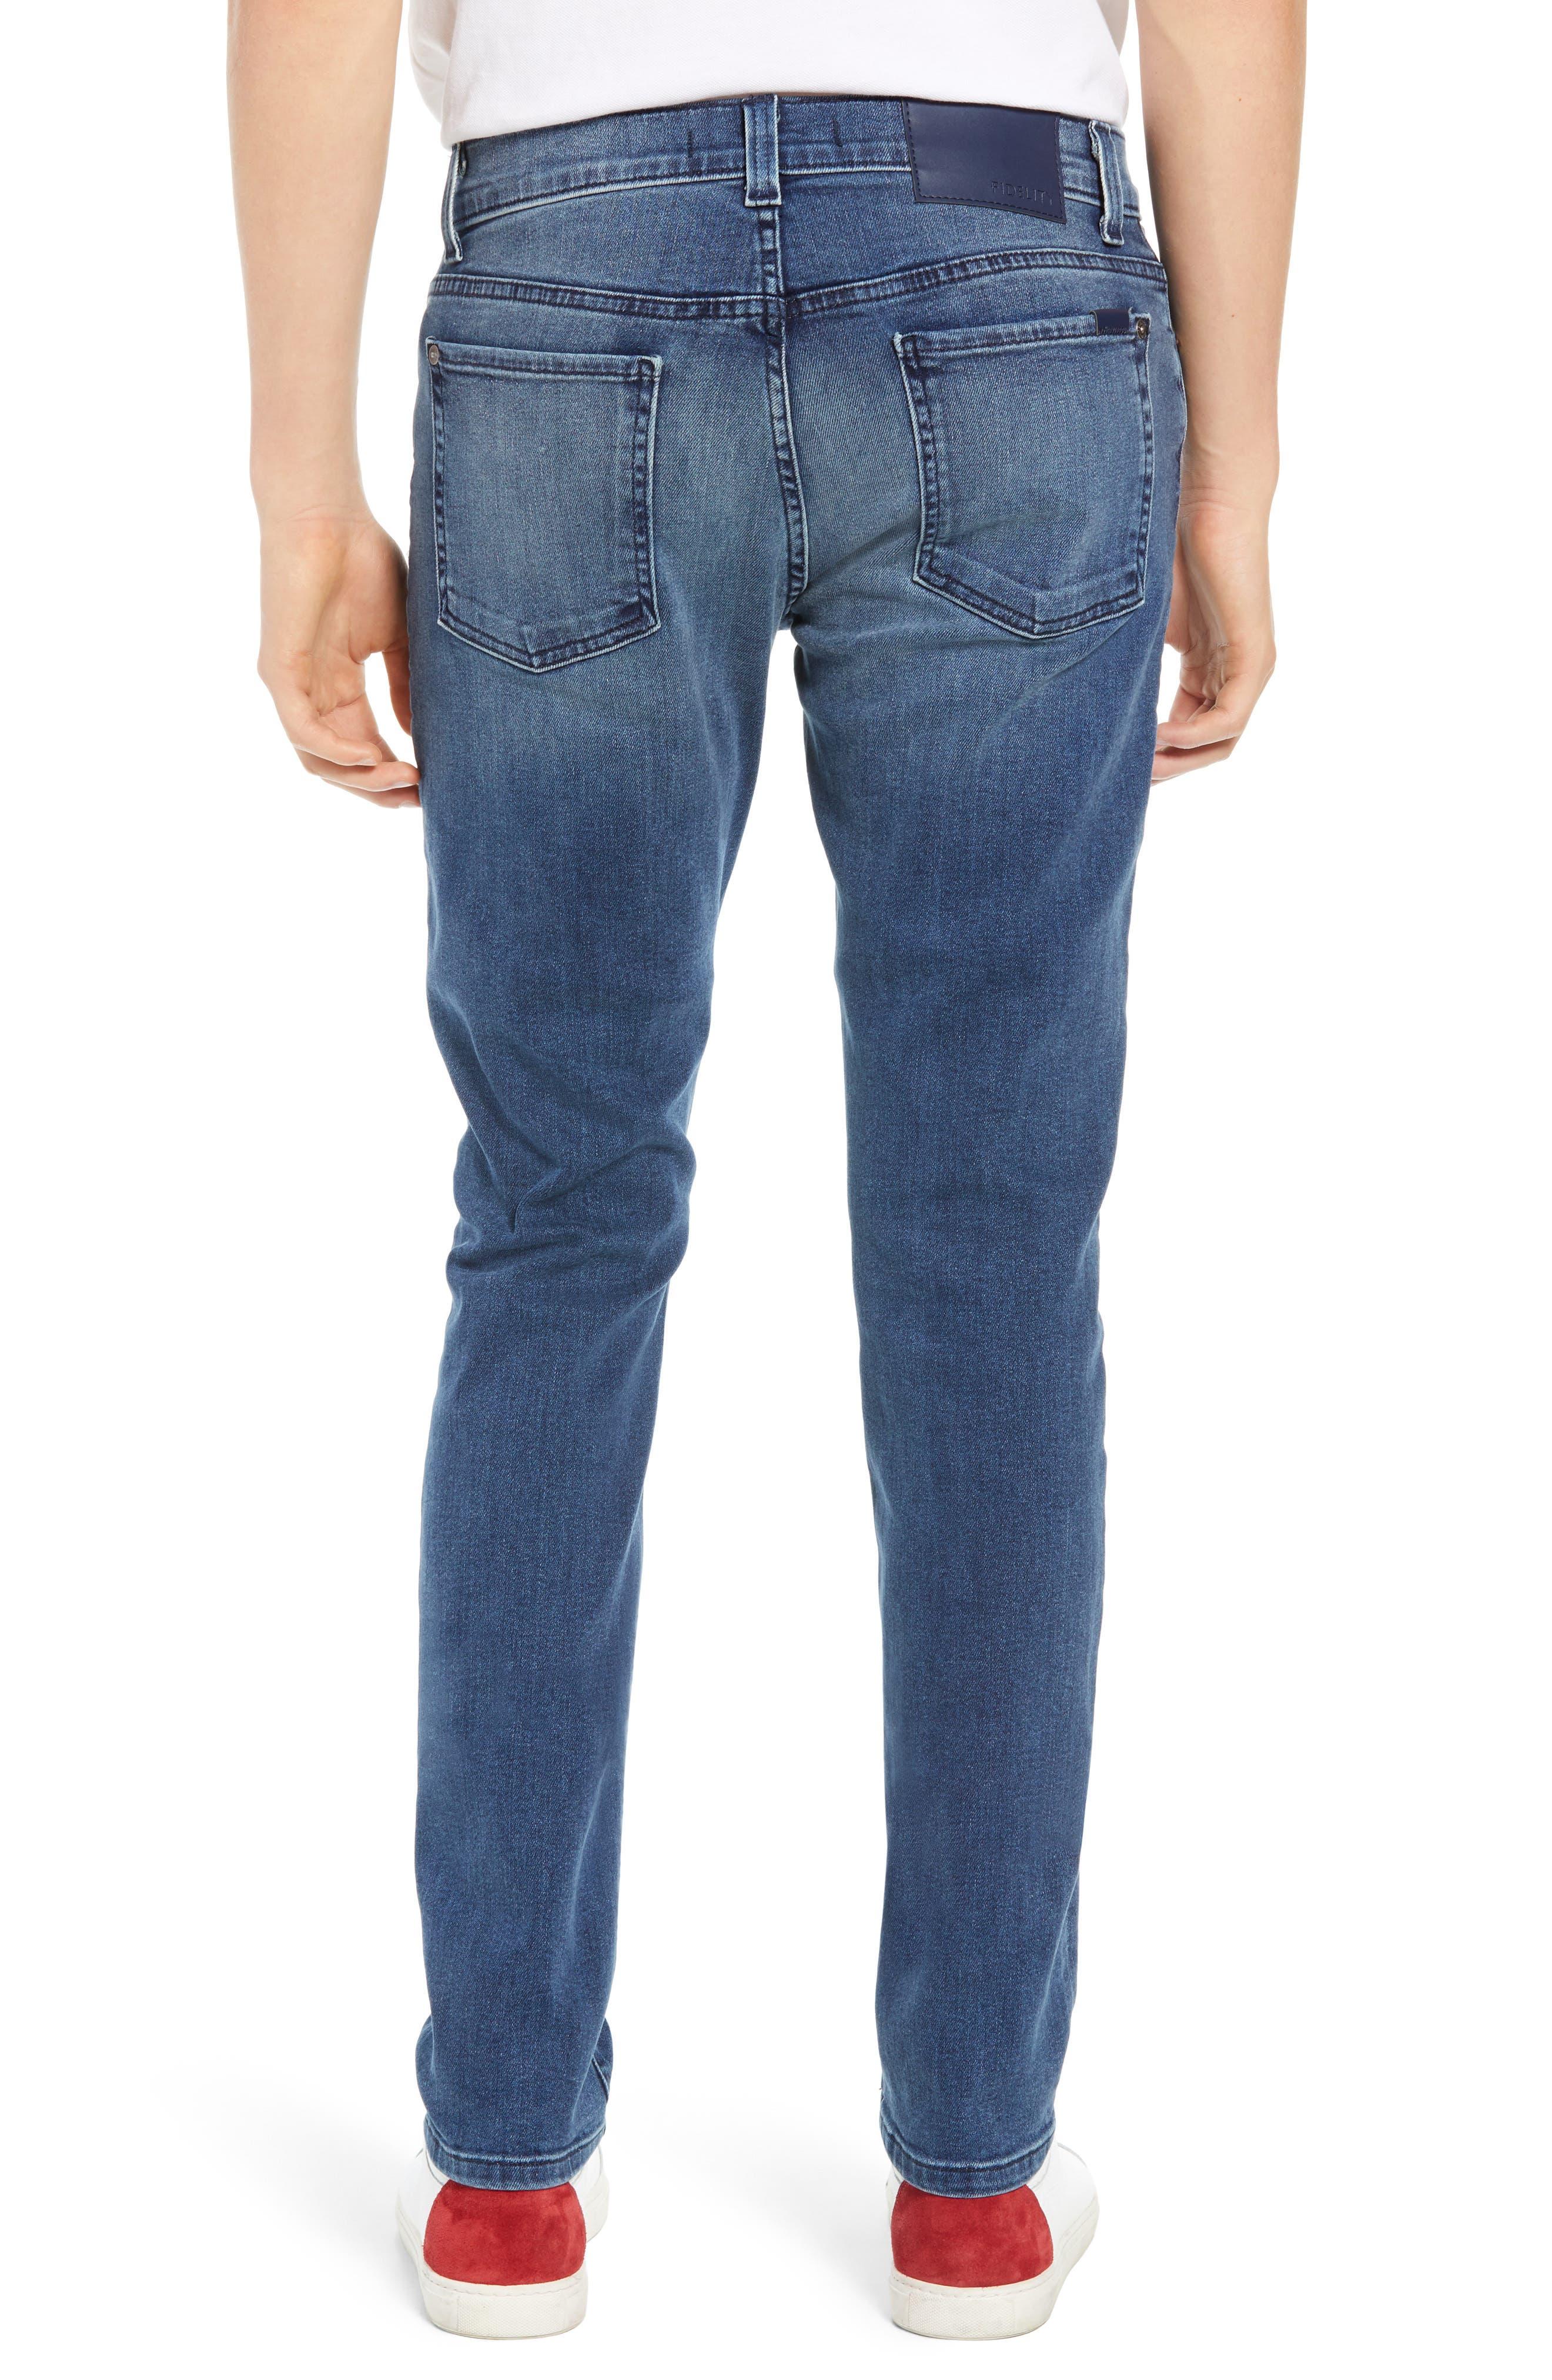 Torino Slim Fit Jeans,                             Alternate thumbnail 2, color,                             EMPIRE BLUE